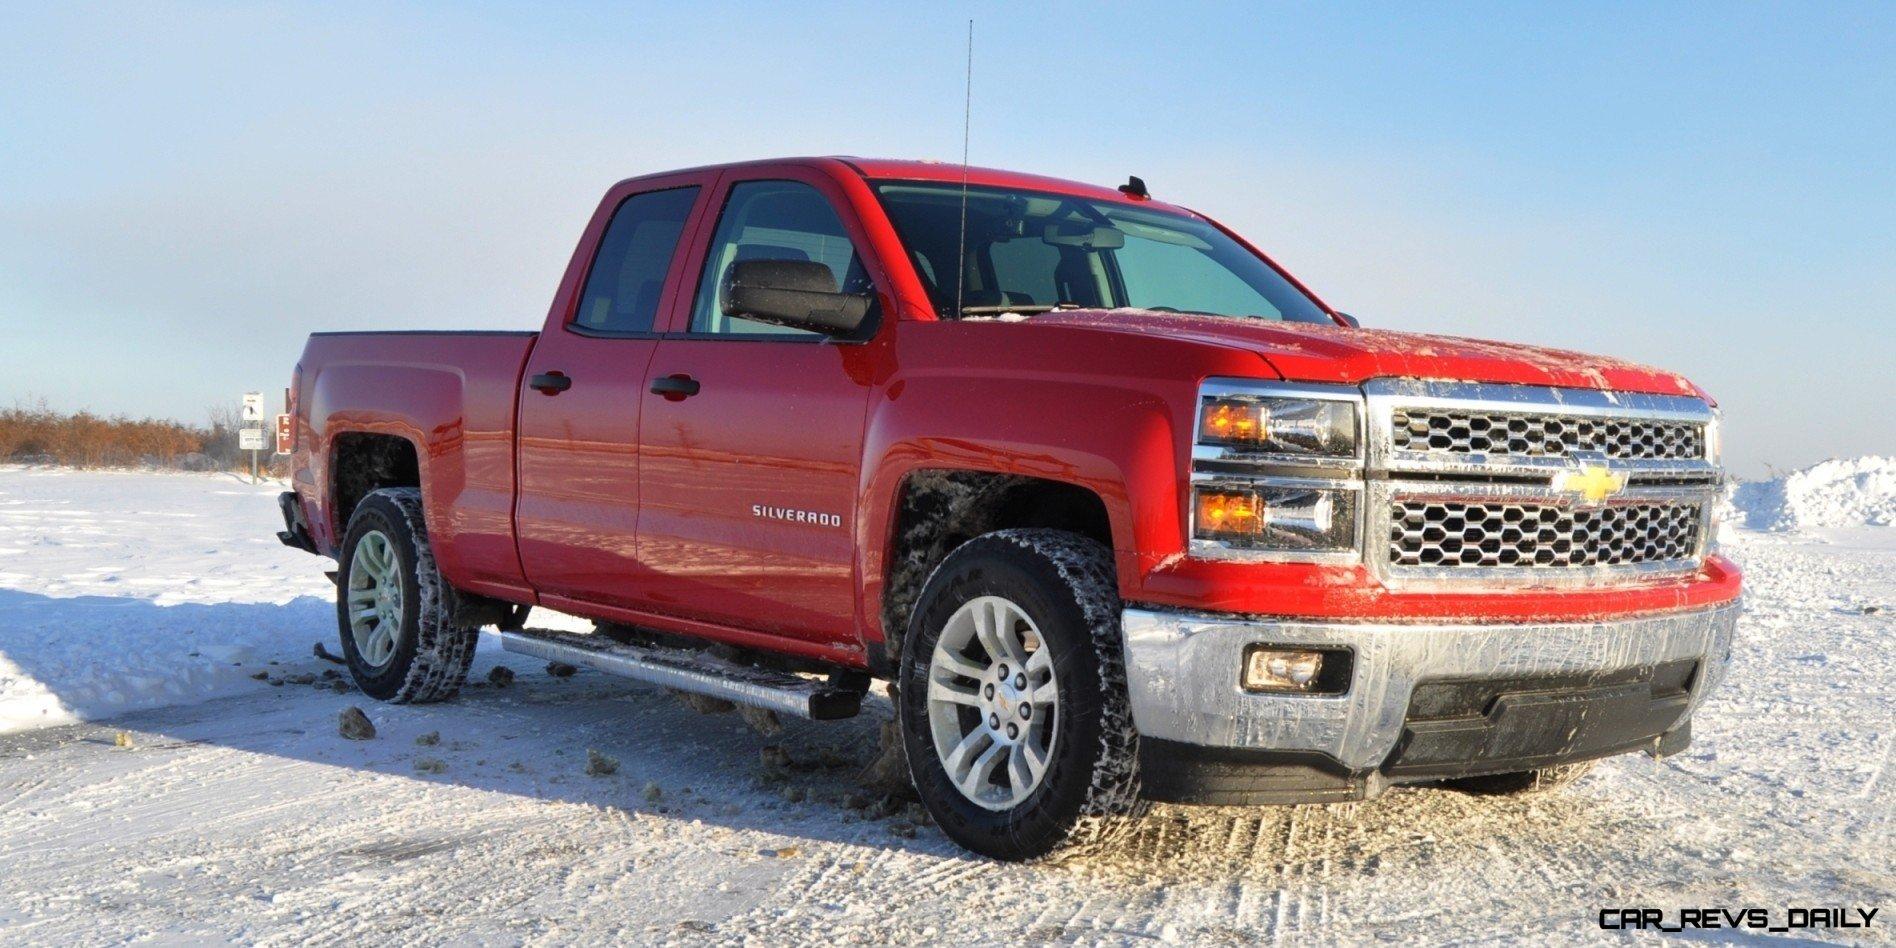 2014 Silverado 1500 LT An All-Star Truck for All Seasons – 120+ High